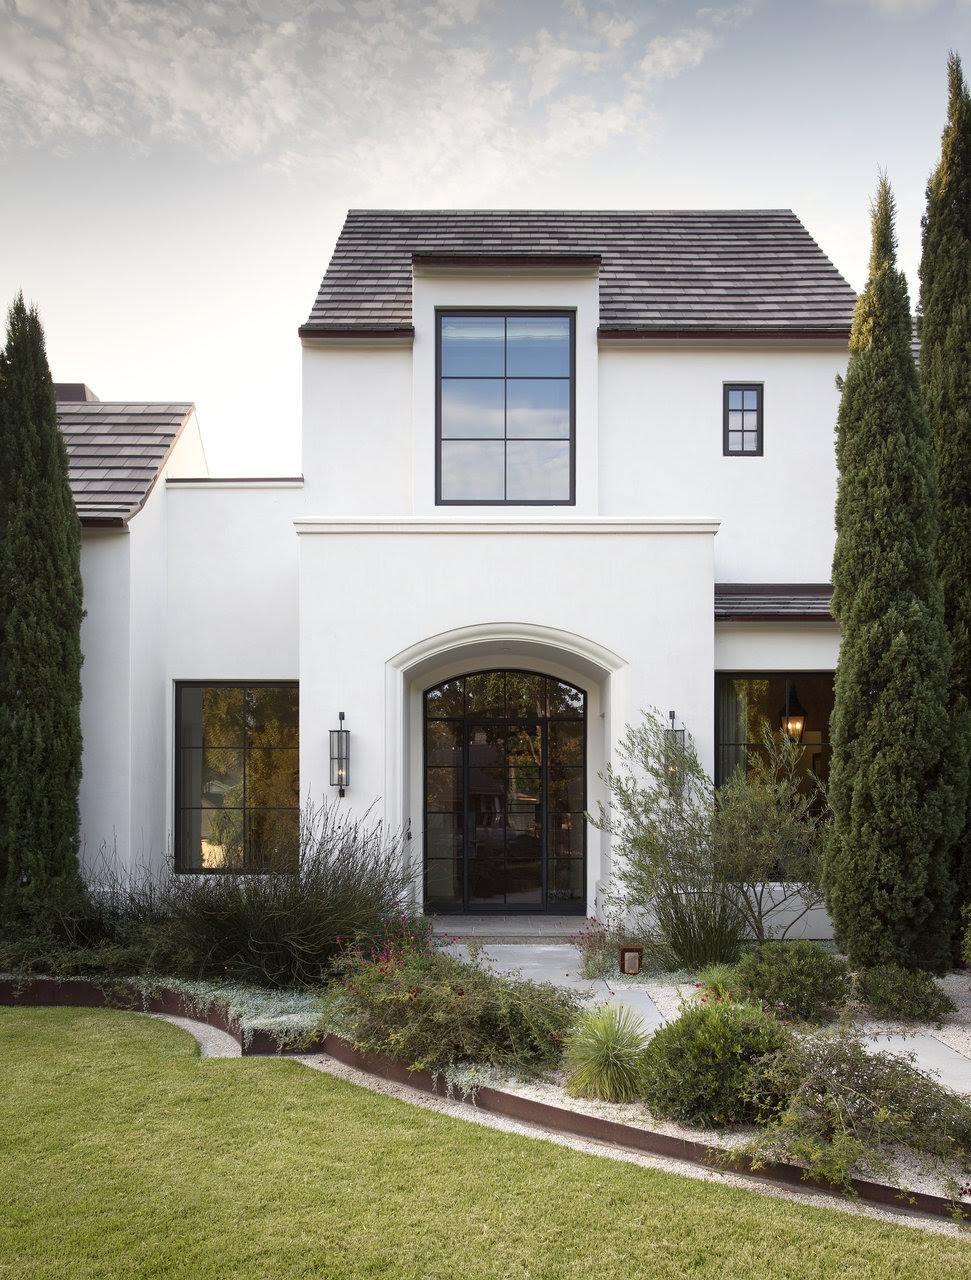 Our Top Picks Exterior Lighting Modern farmhouse